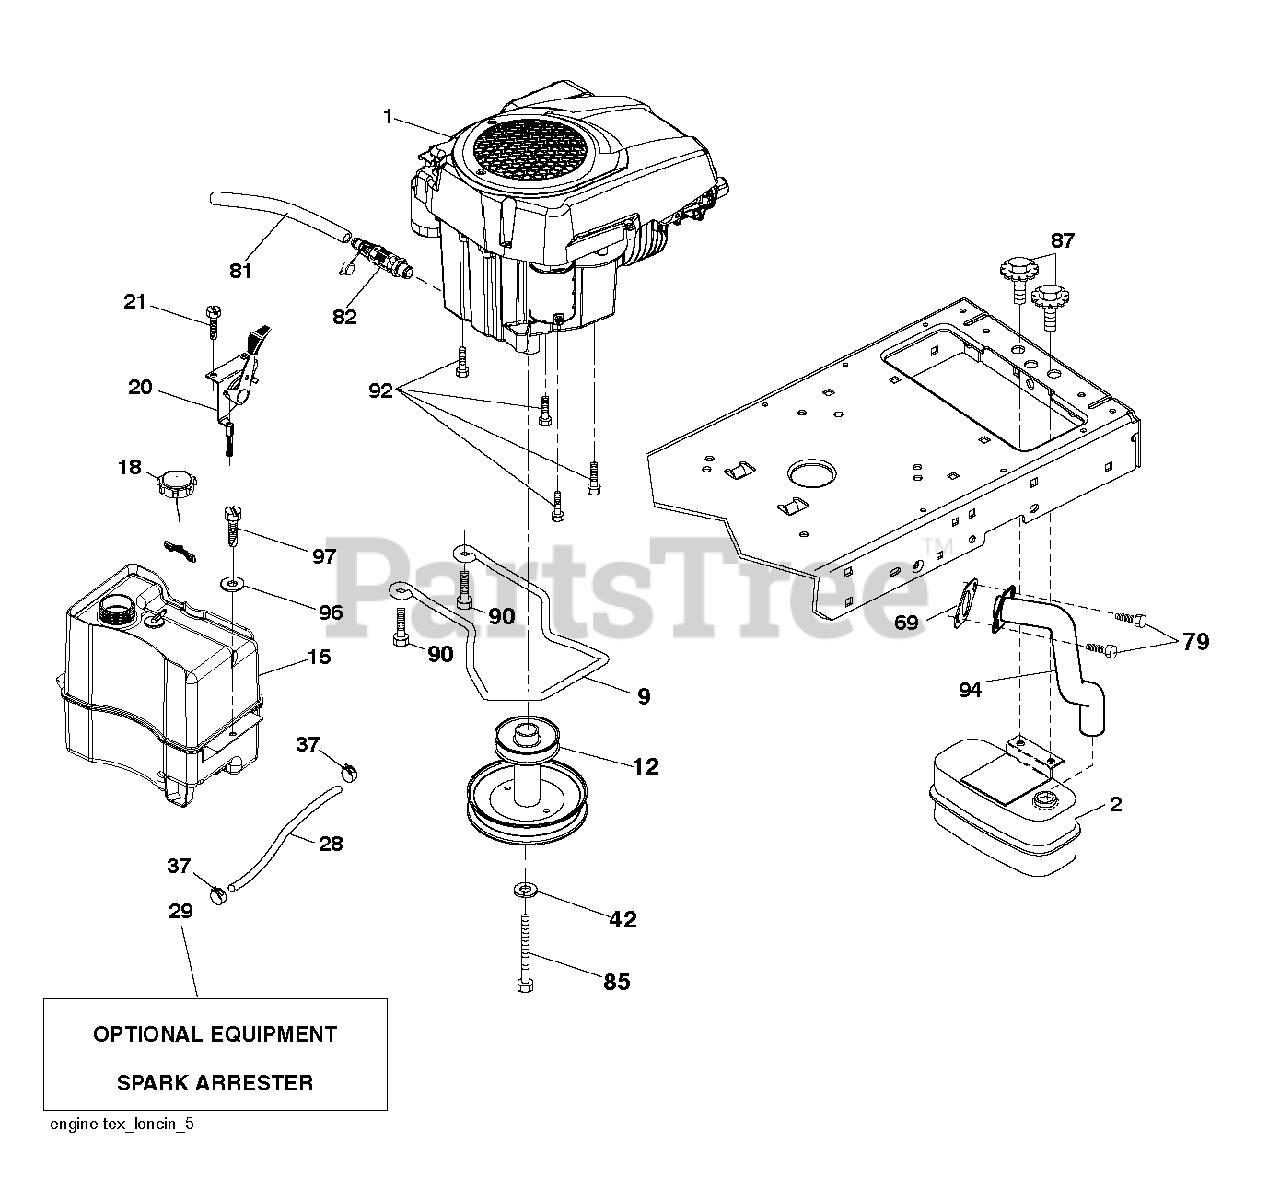 Husqvarna Parts On The Engine Diagram For Yth